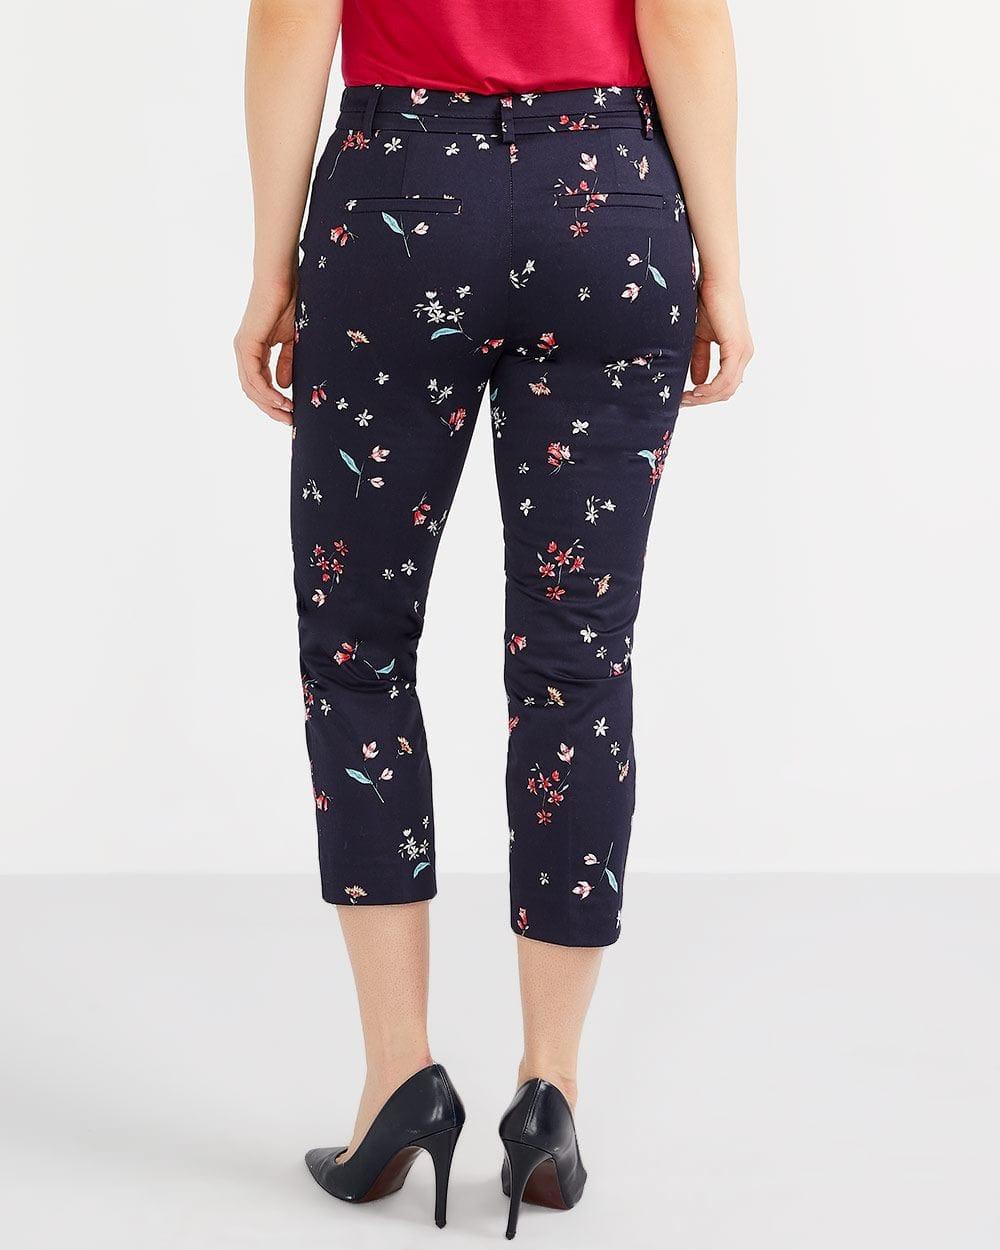 Petite Cotton Blend Printed Cropped Pants